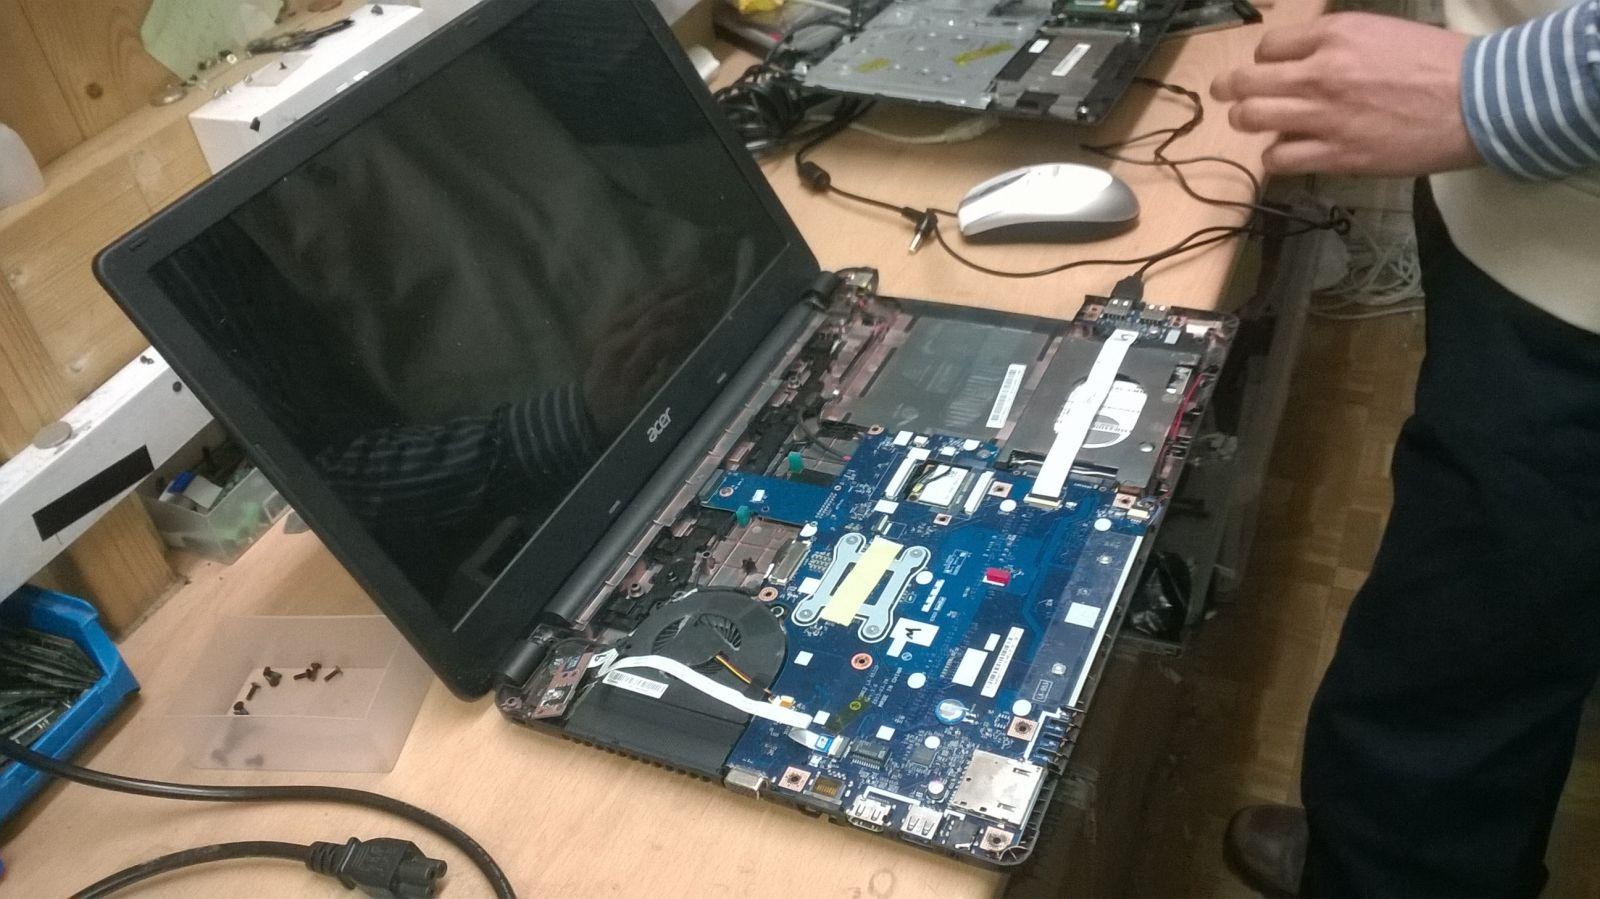 Sửa Chữa Laptop Quận 8